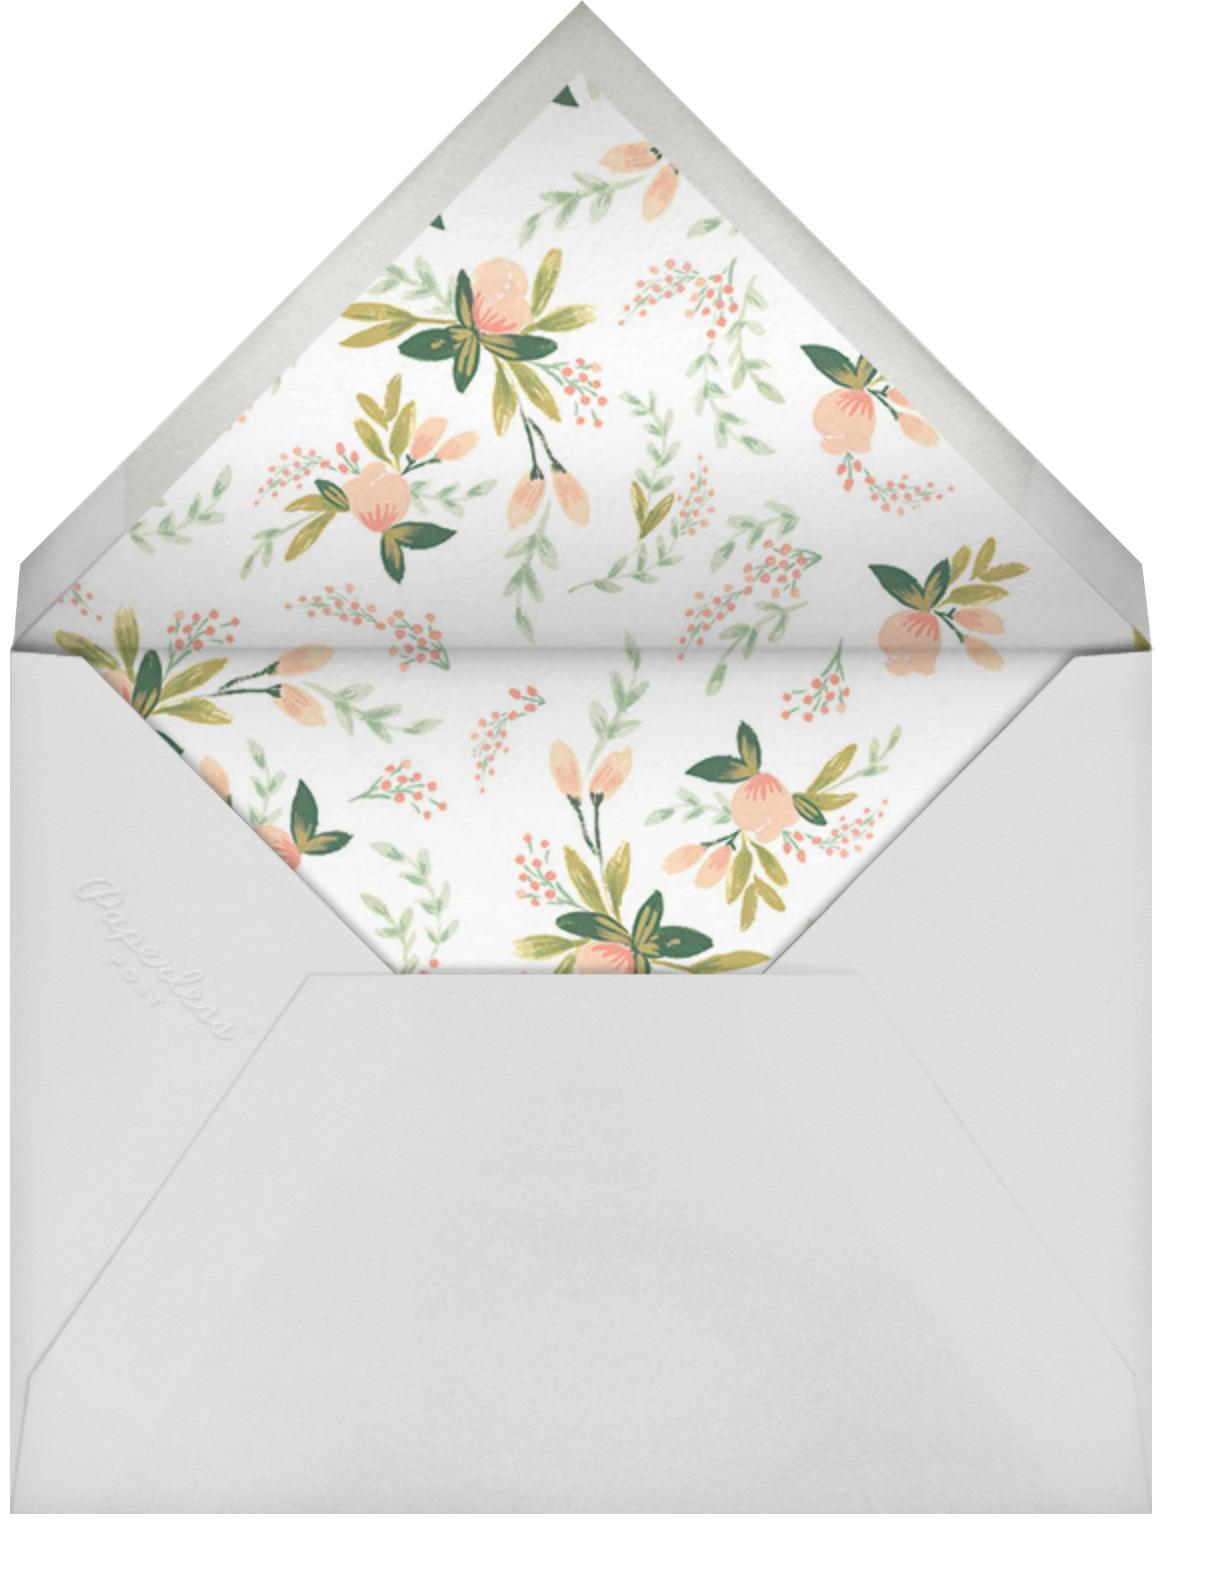 Peach Posies - Rifle Paper Co. - Baptism  - envelope back